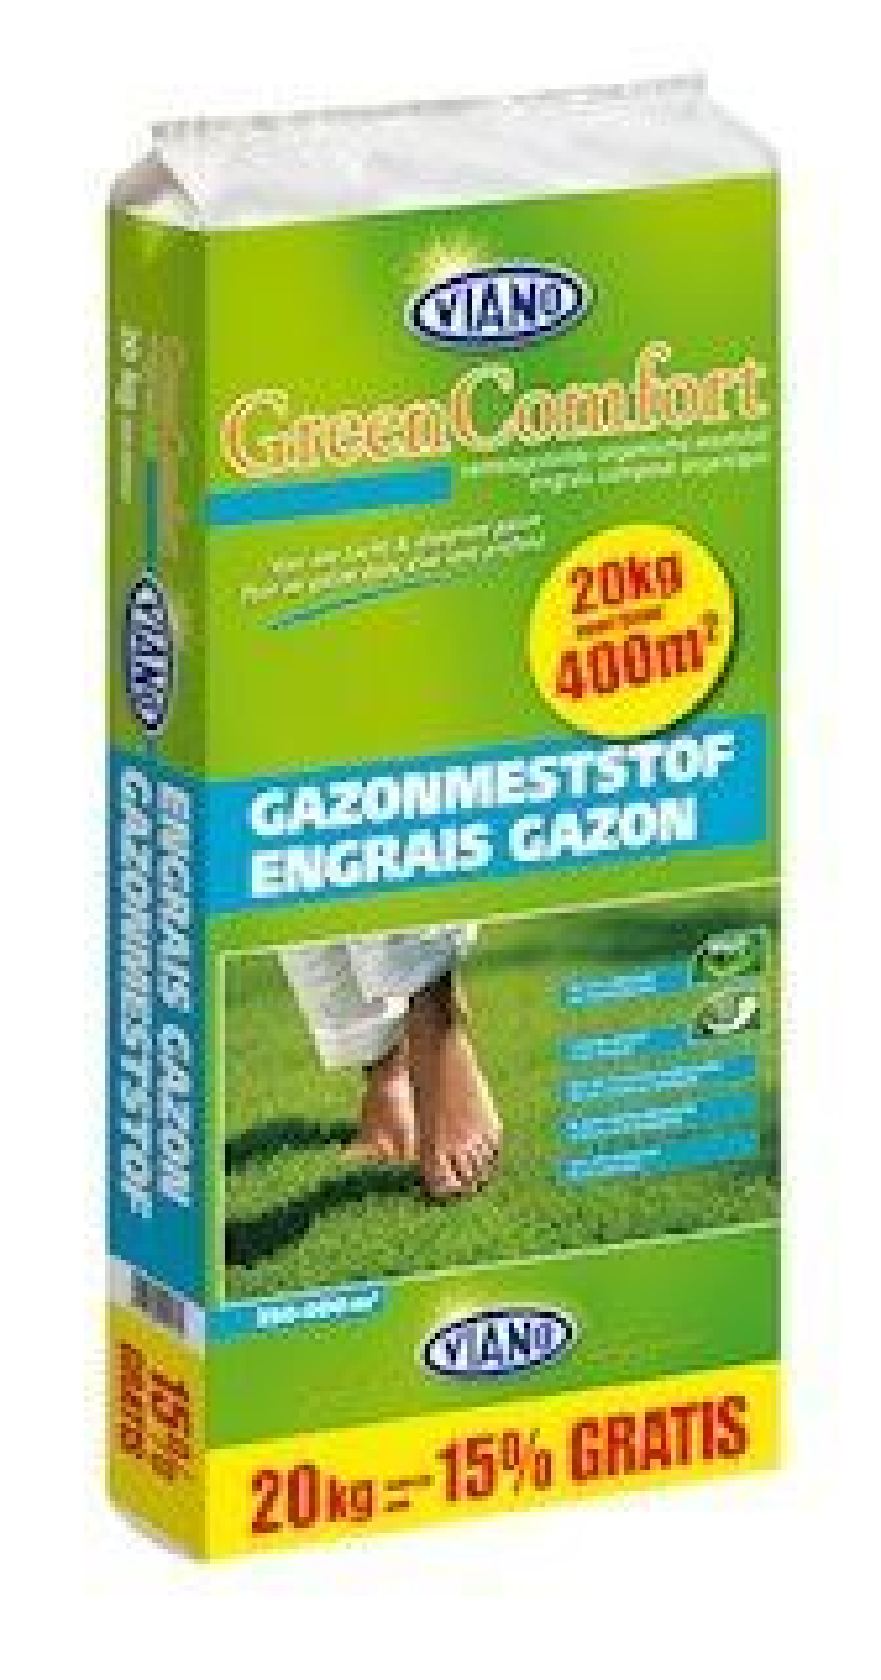 Gazonmeststof-Magnesium-zak-17-5kg-2-5kg-Gratis-NPK-9-3-3-3MgO-